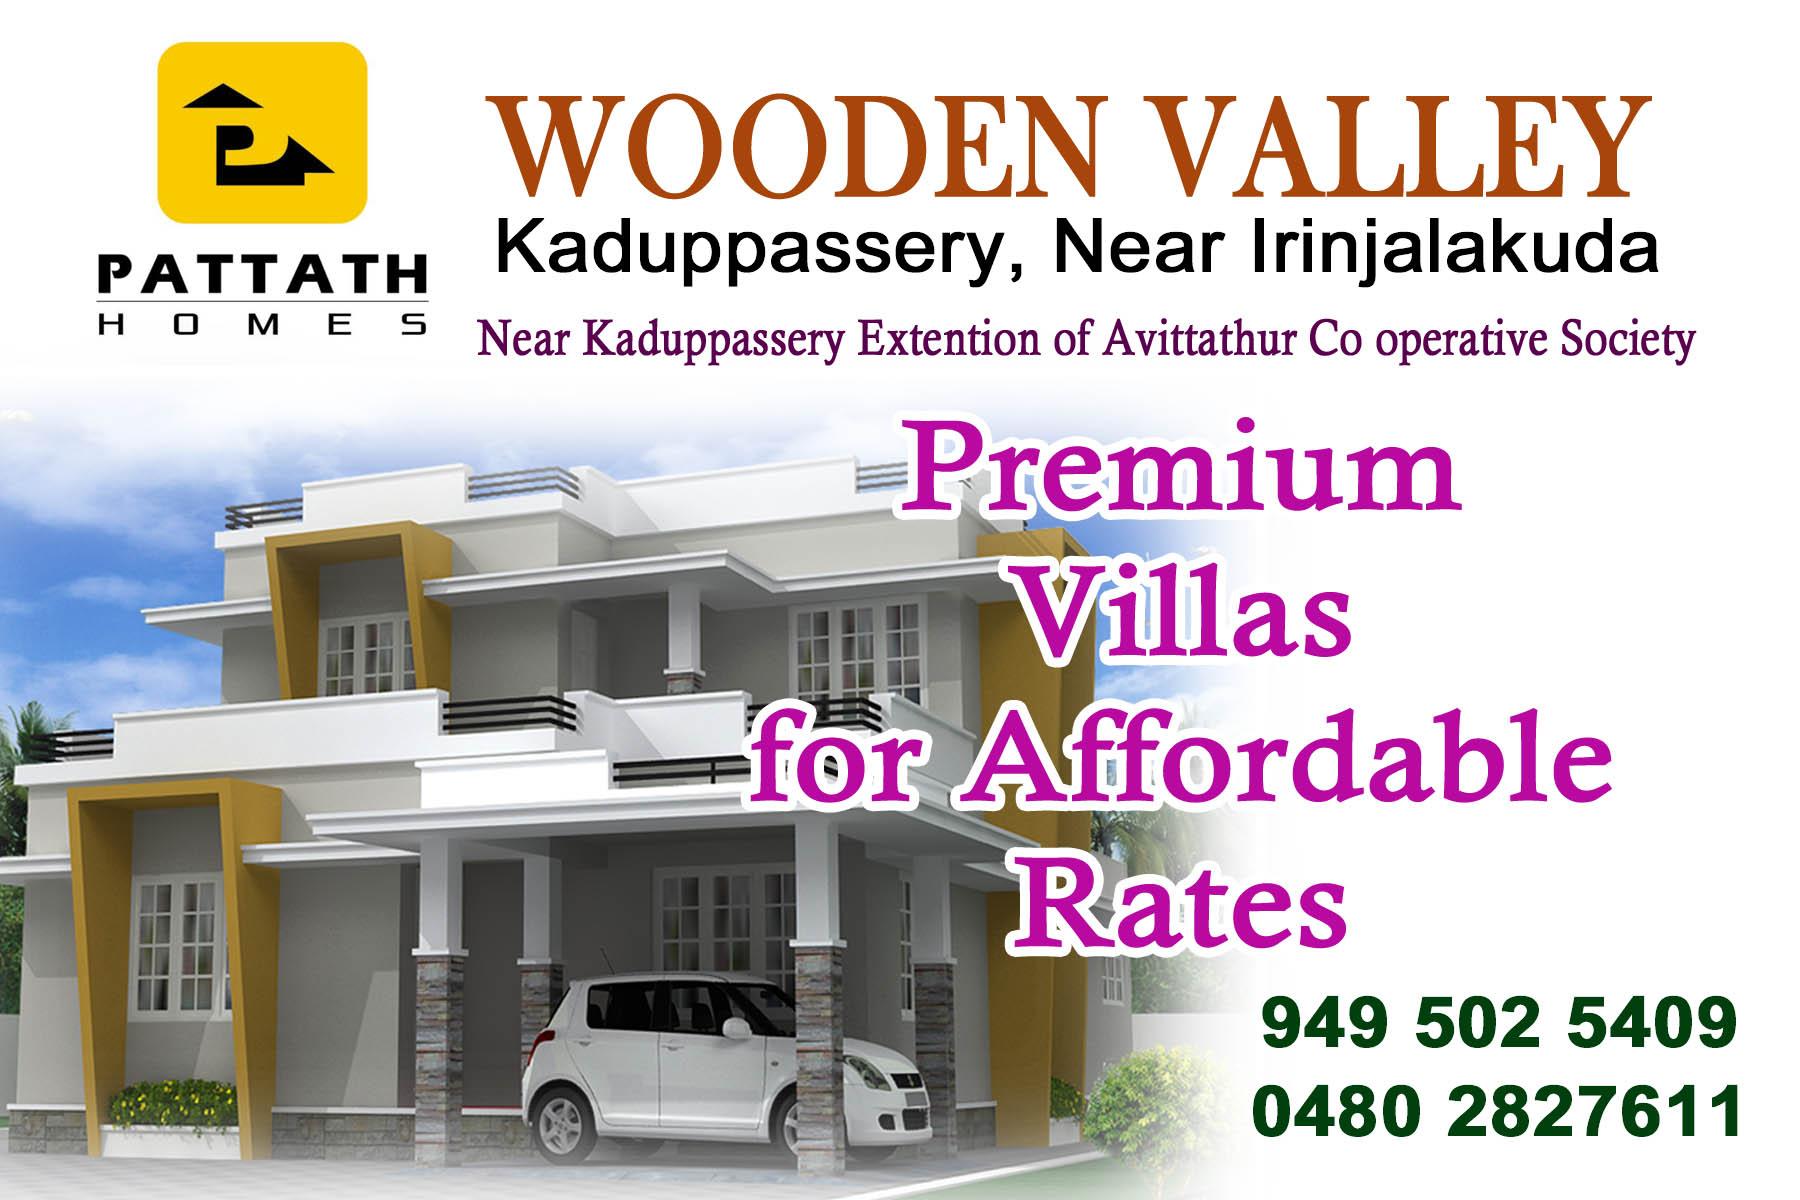 Pattath Homes provid